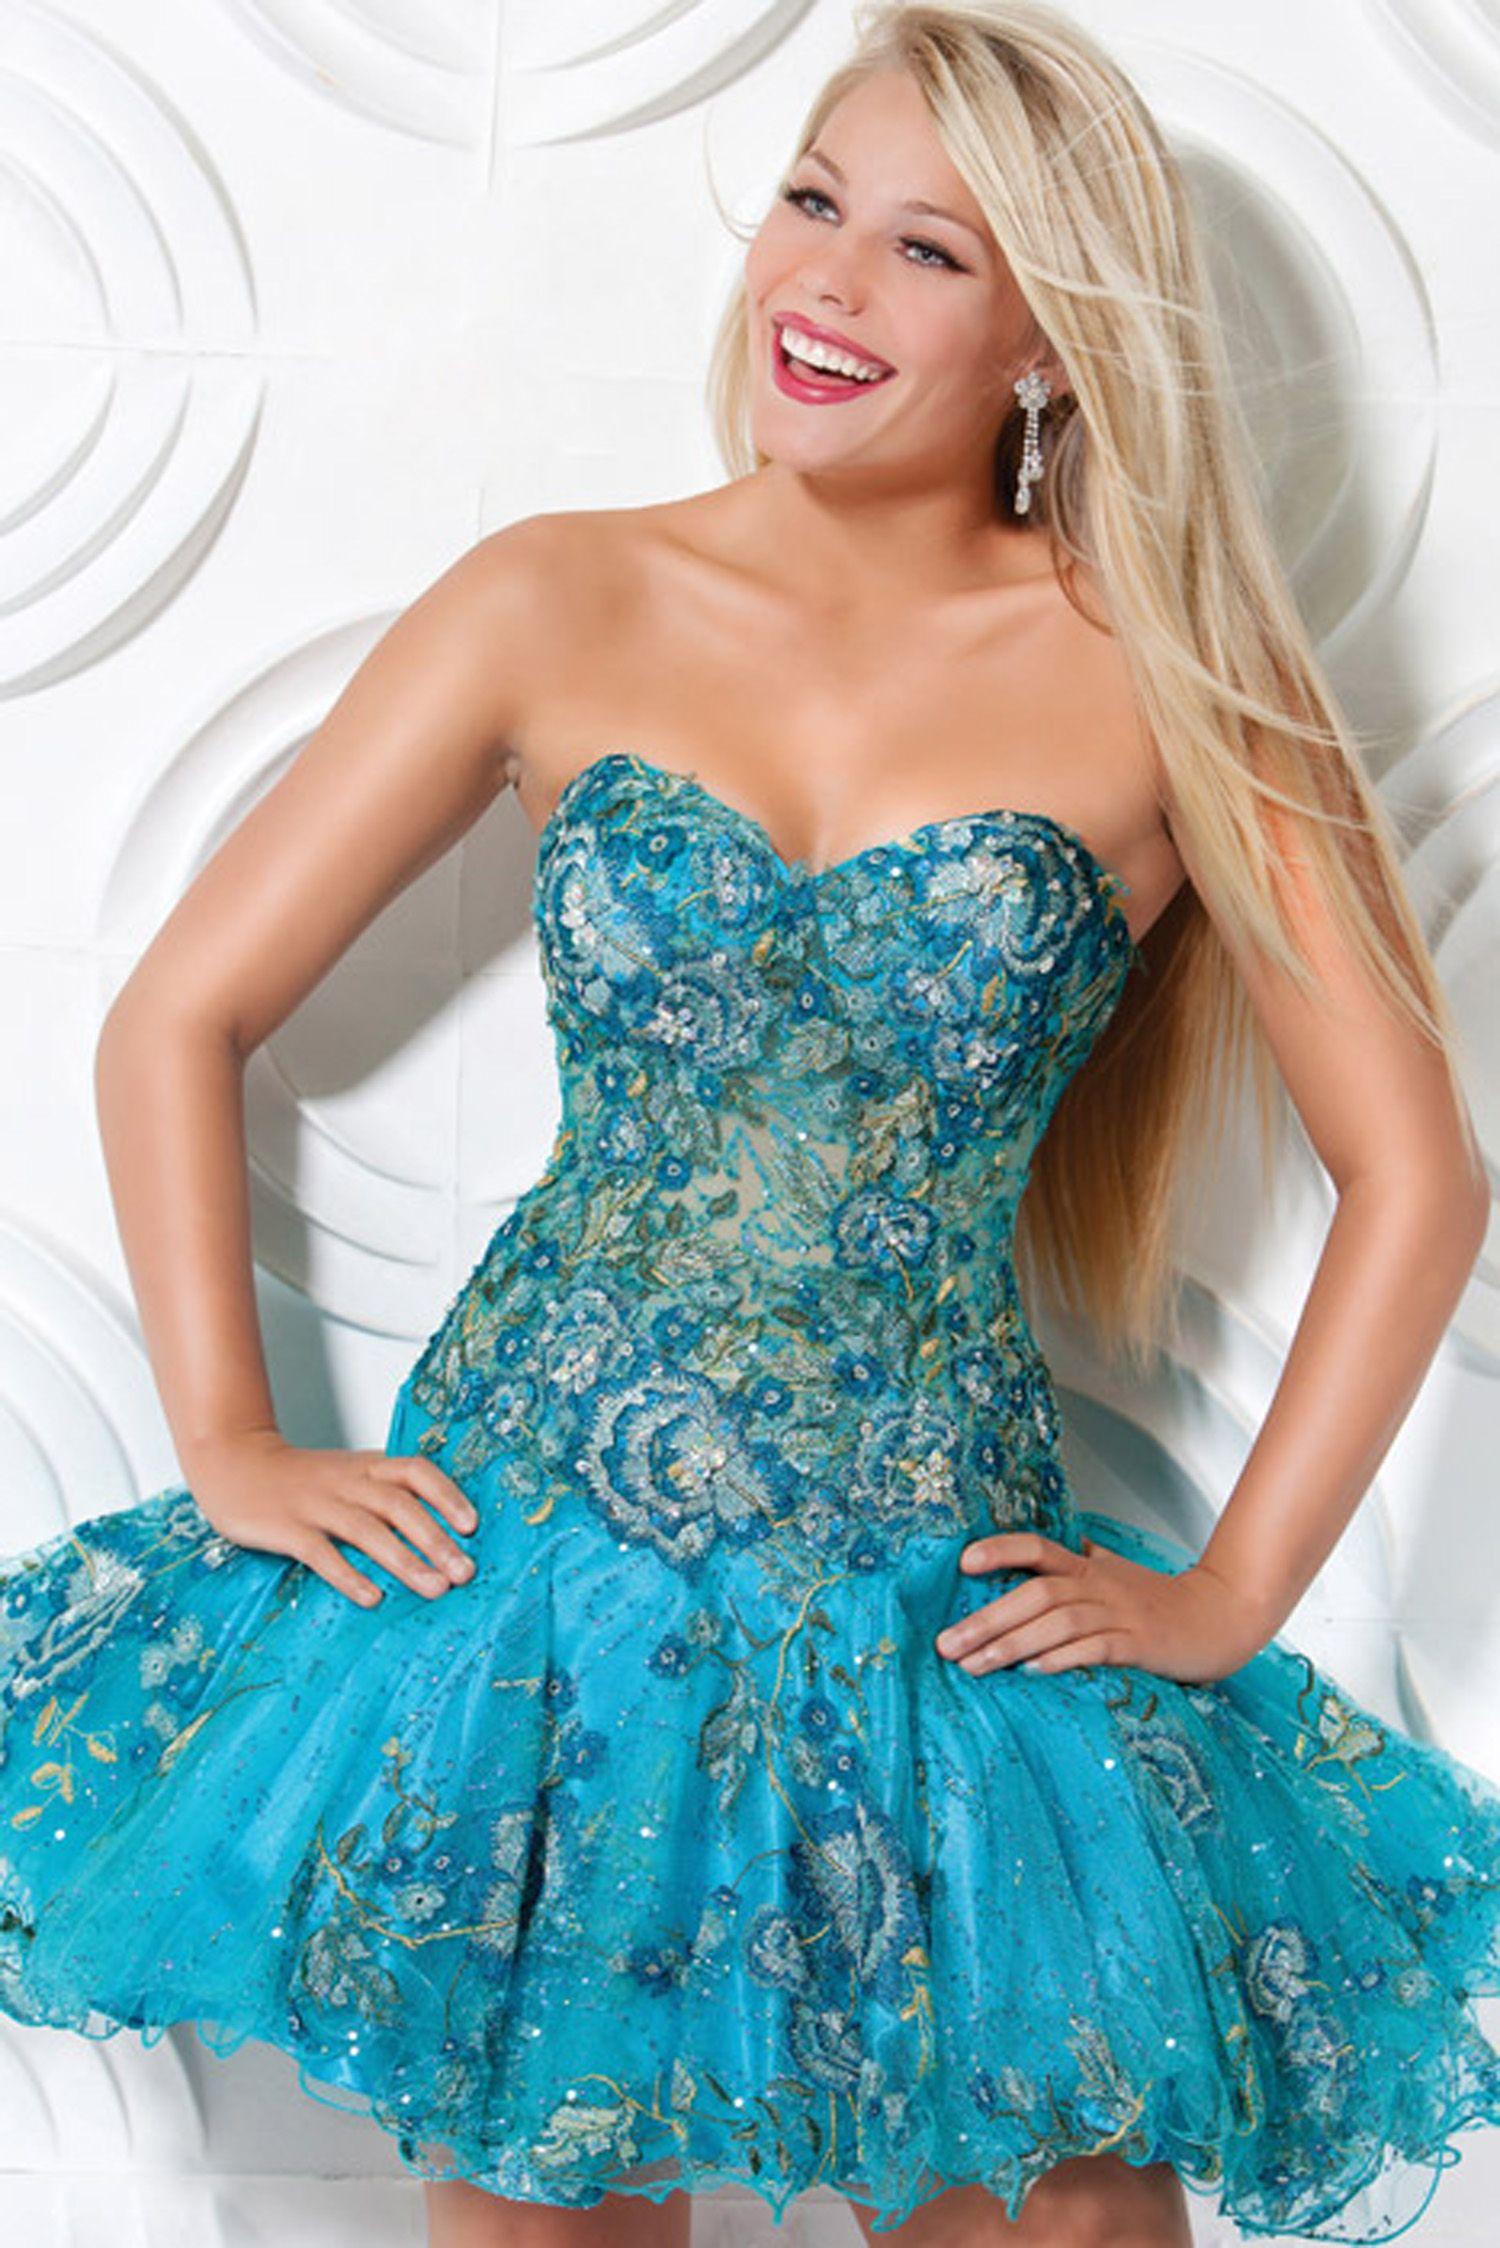 Jovani Prom Dress Style 173321 | Fashion | Pinterest | Prom ...